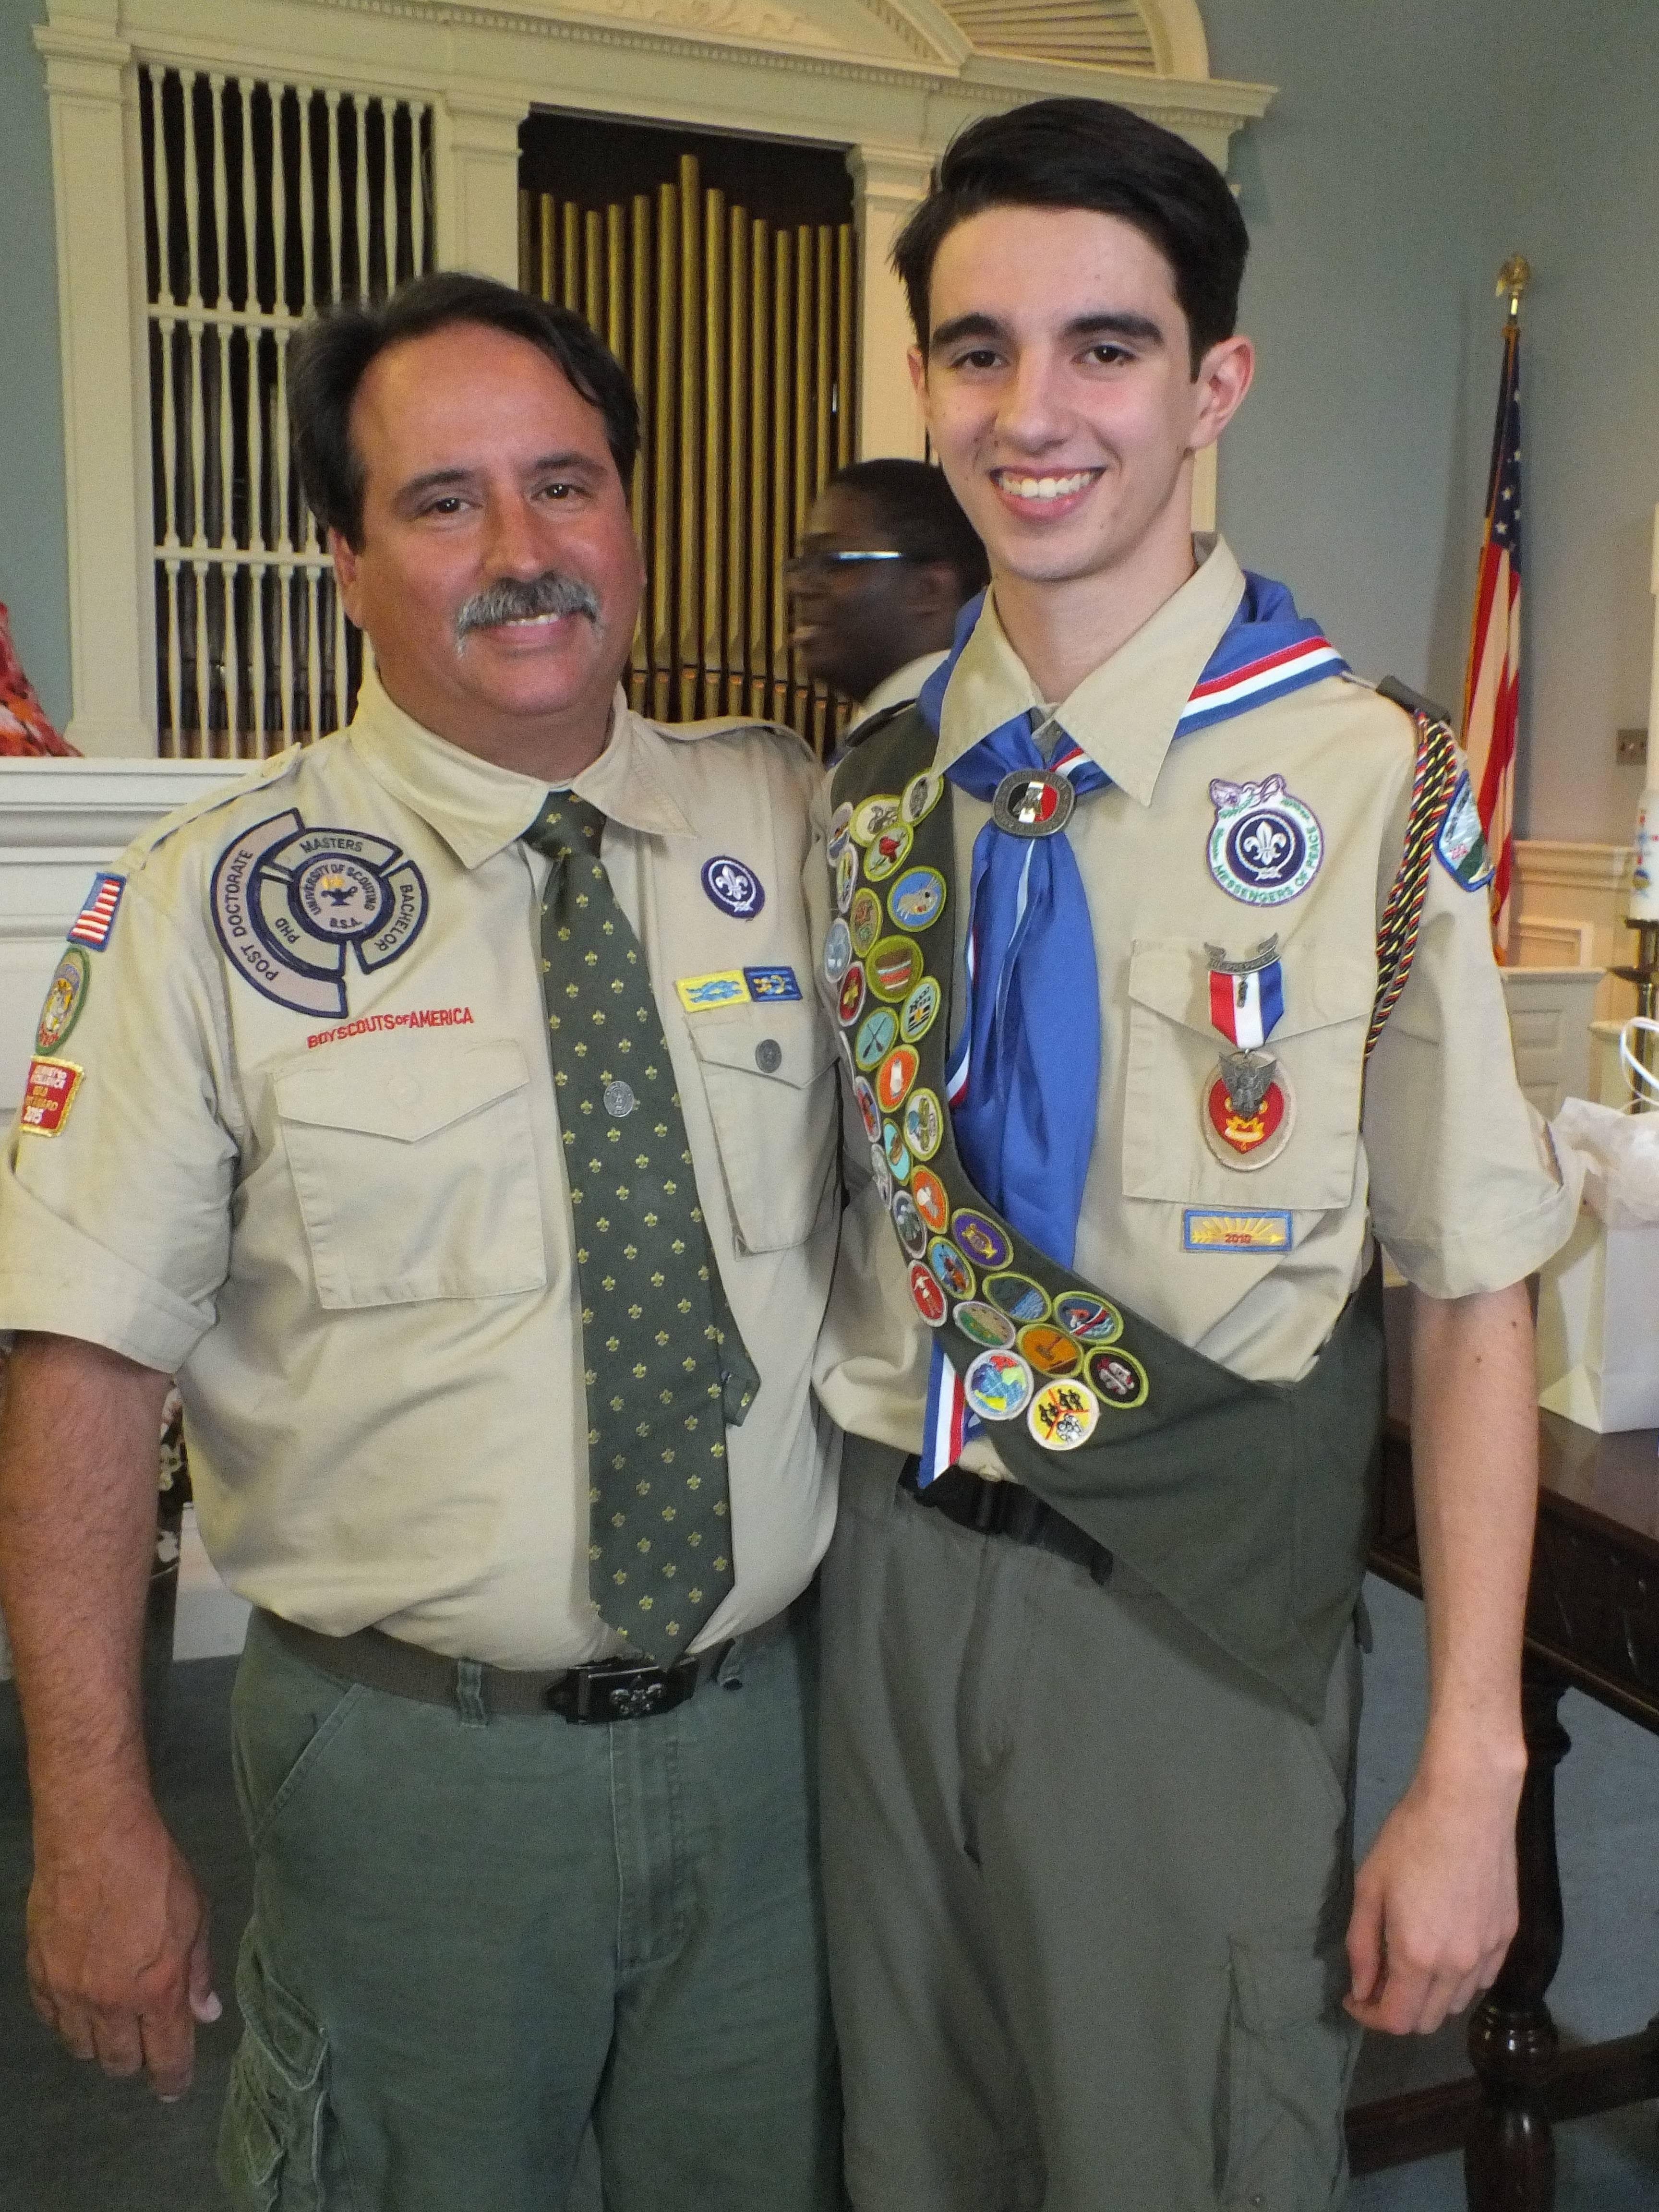 eea82854f85d1cff35c2_Jason_and_Alex_Rivera-Eagle_Scout_Honors.jpg